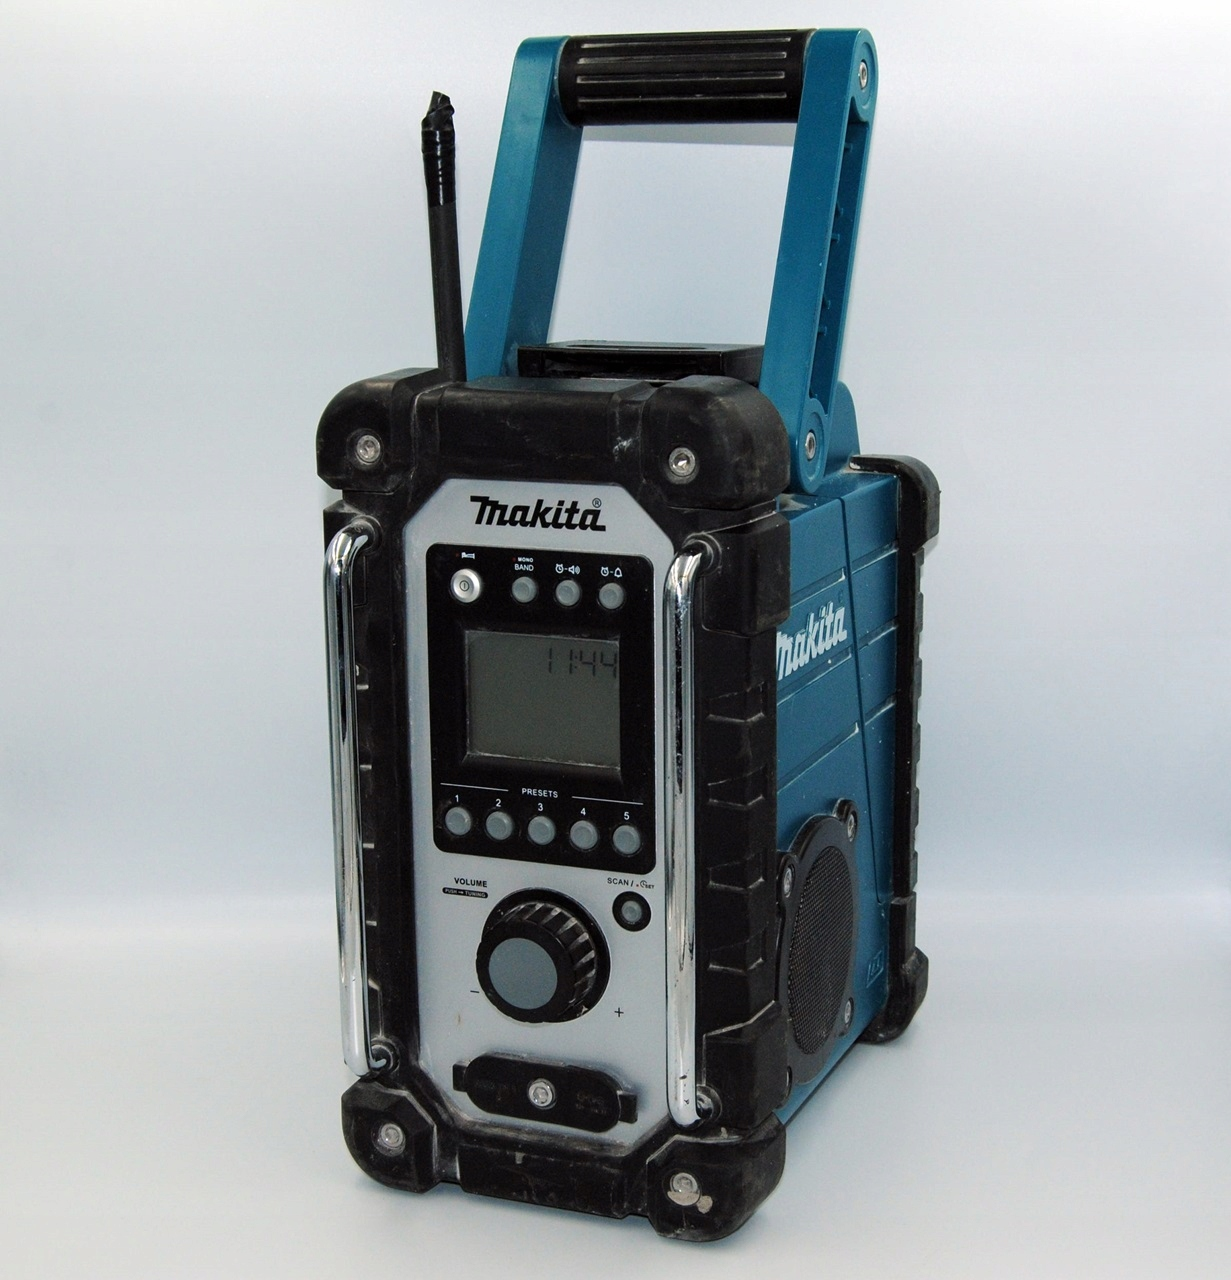 RADIO BUDOWLANE MAKITA DMR102 + AKUMULATOR